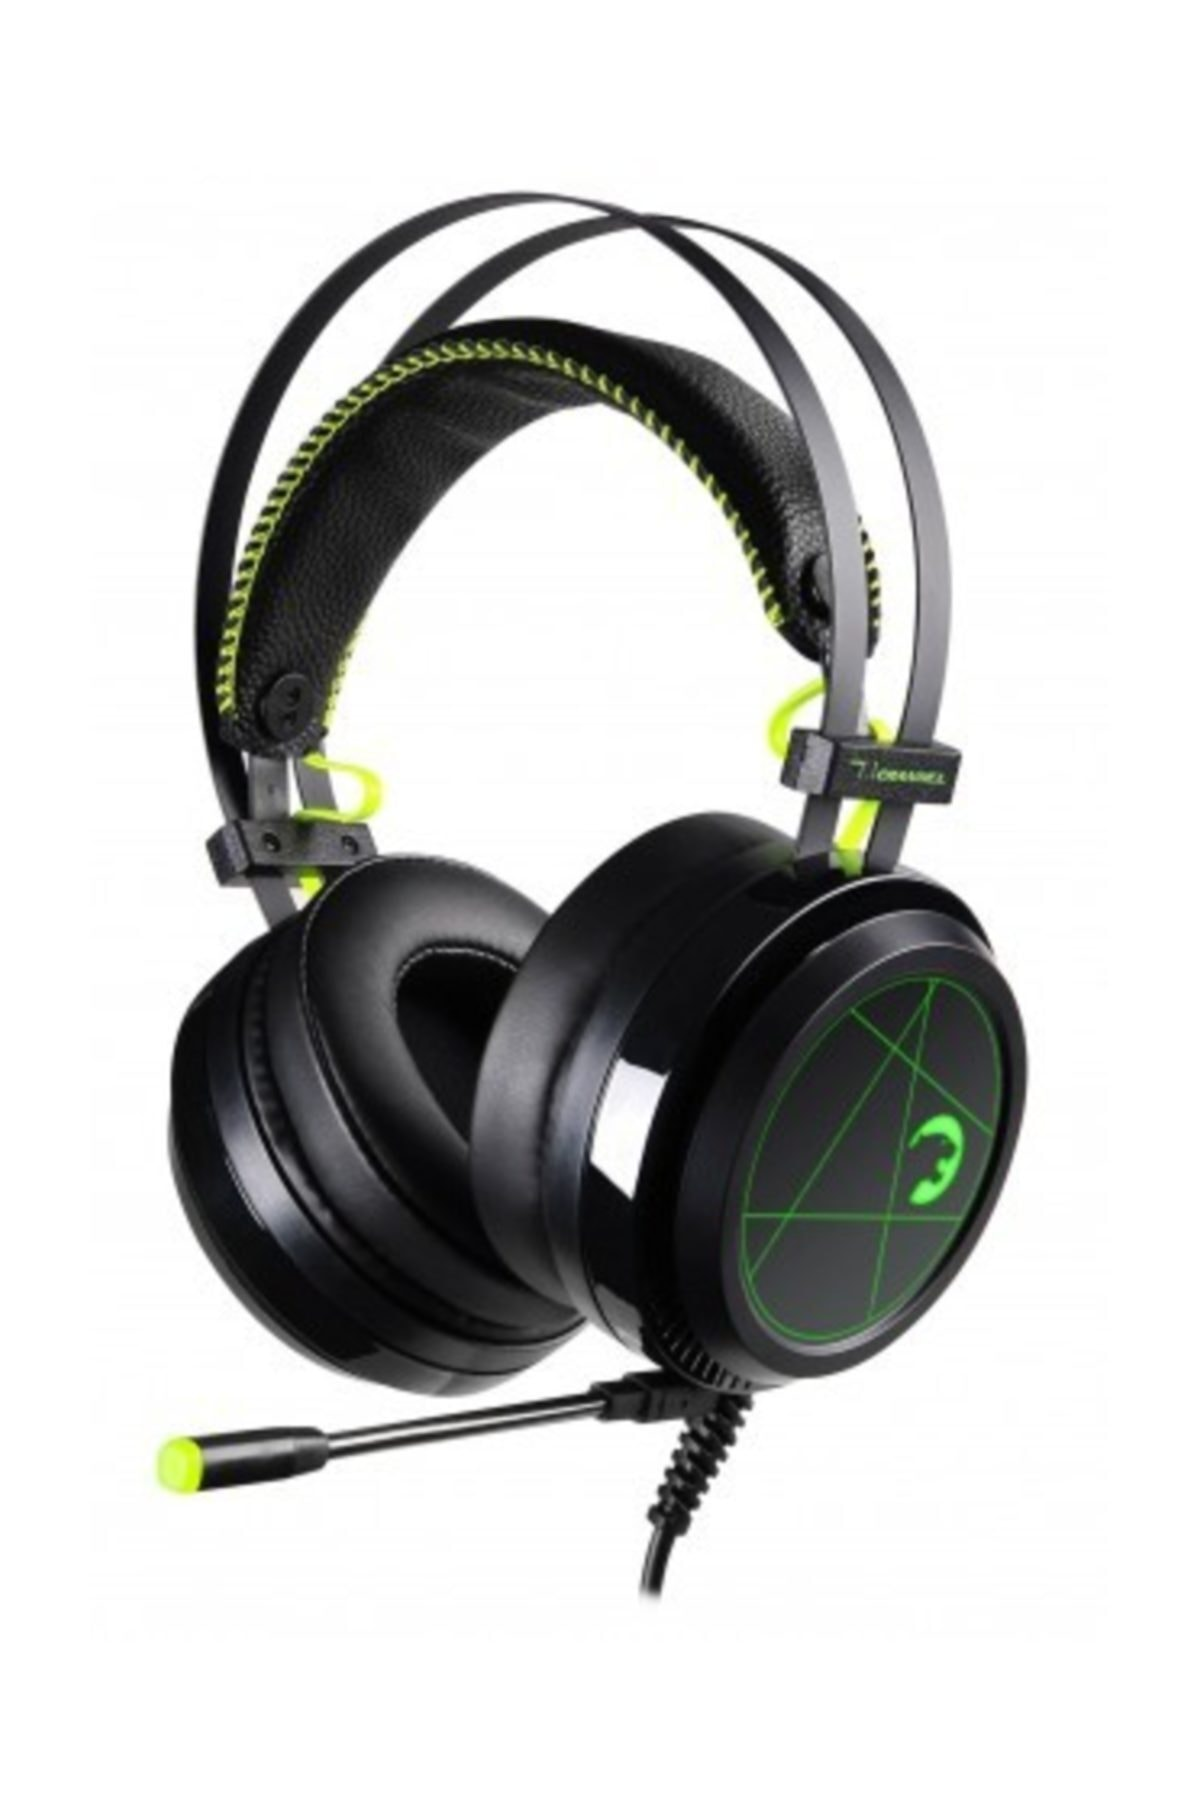 Medusa Siyah 7.1 Pro Oyuncu Kulaklığı